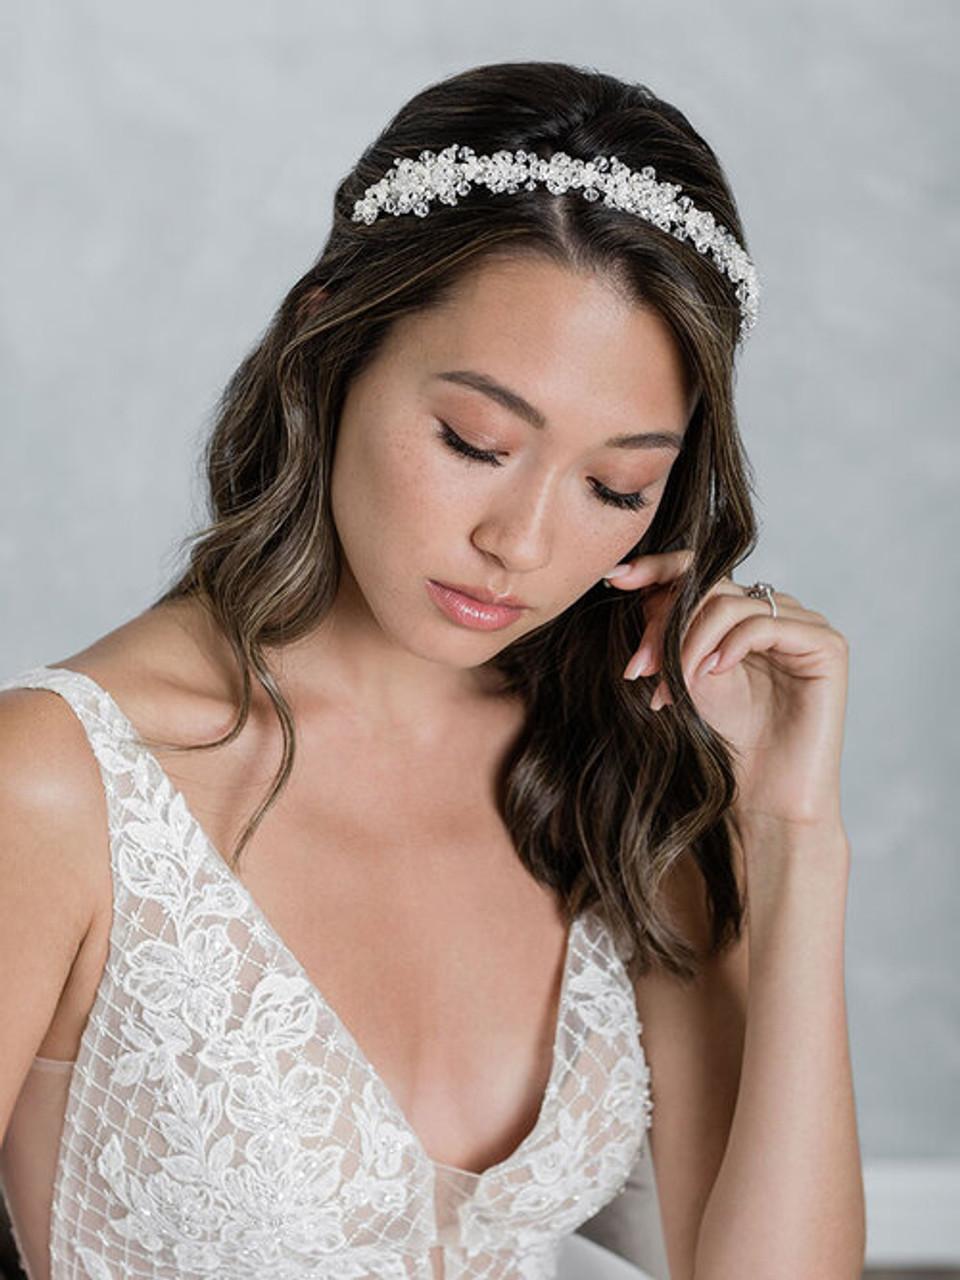 Bel Aire Bridal 2026 - Headband of pearls, crystals, and rhinestones